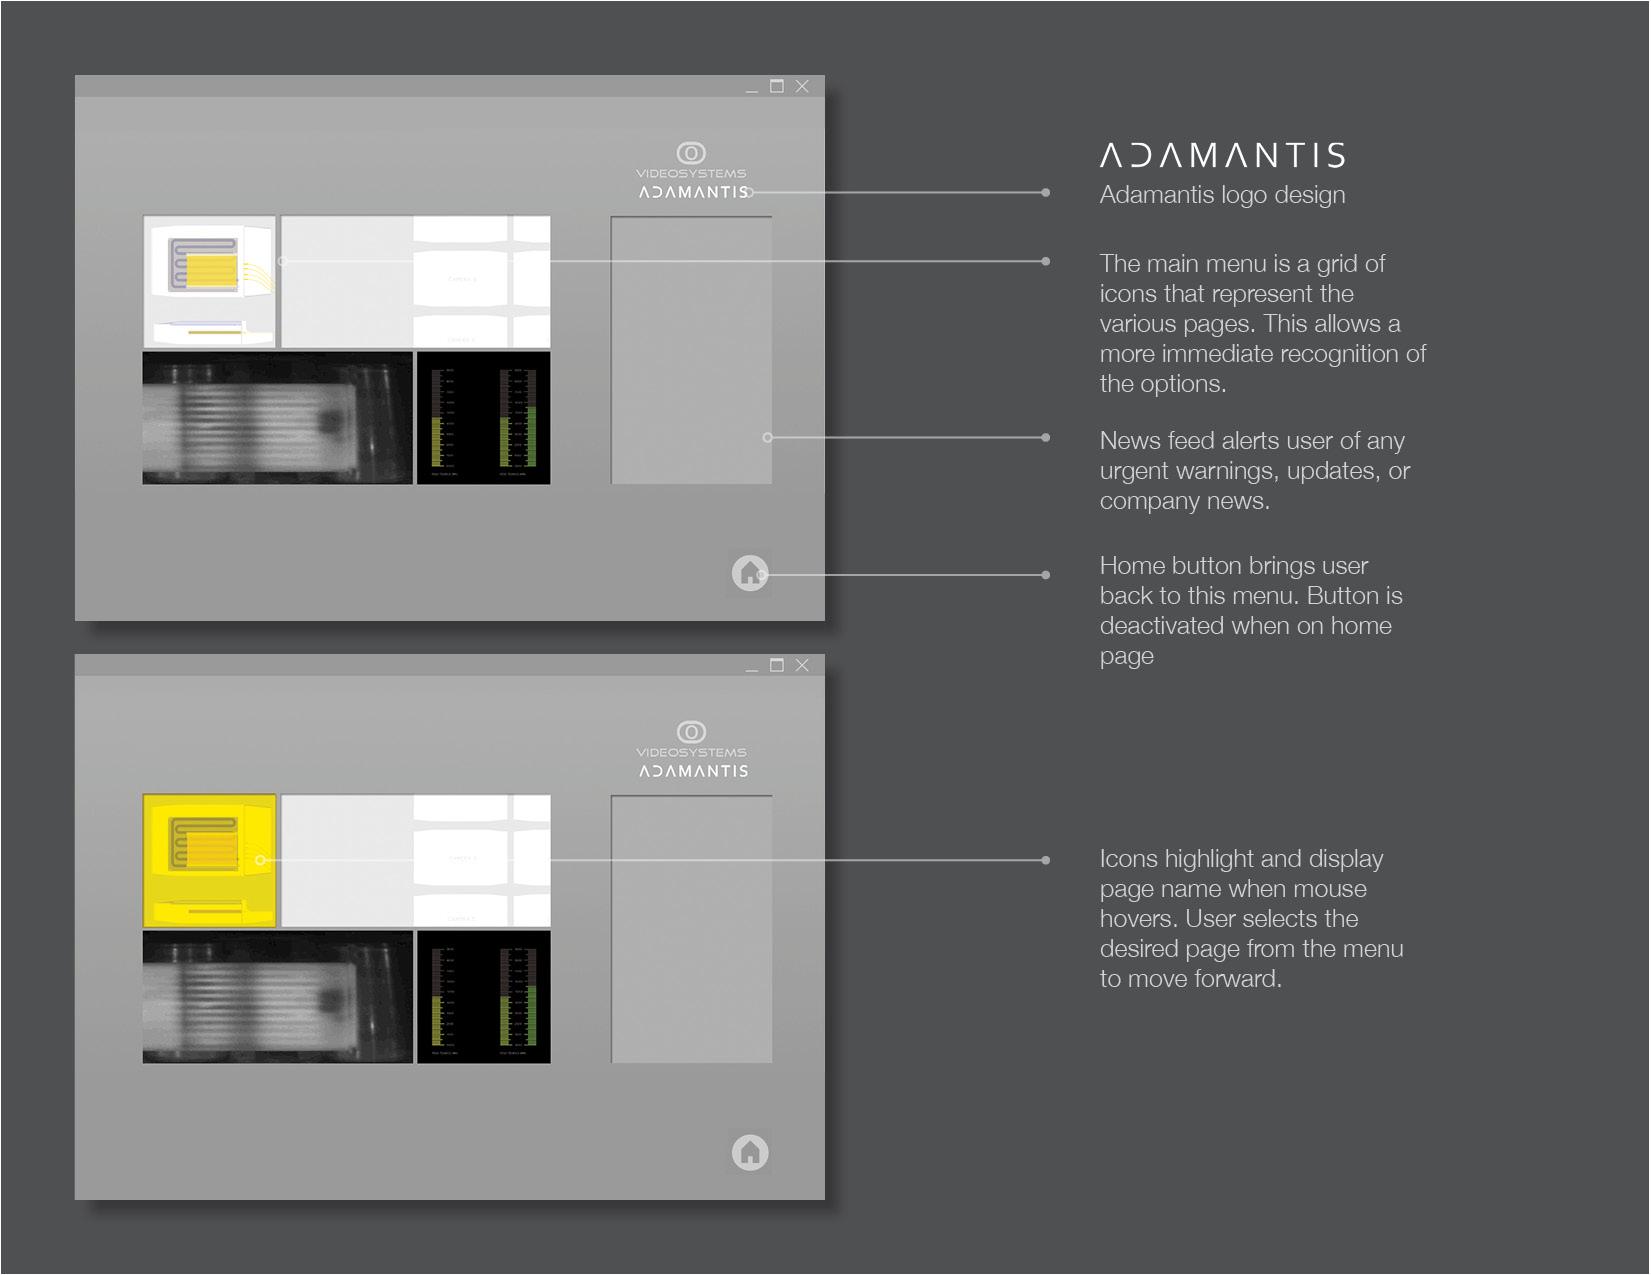 Adamantis Slide5.jpg